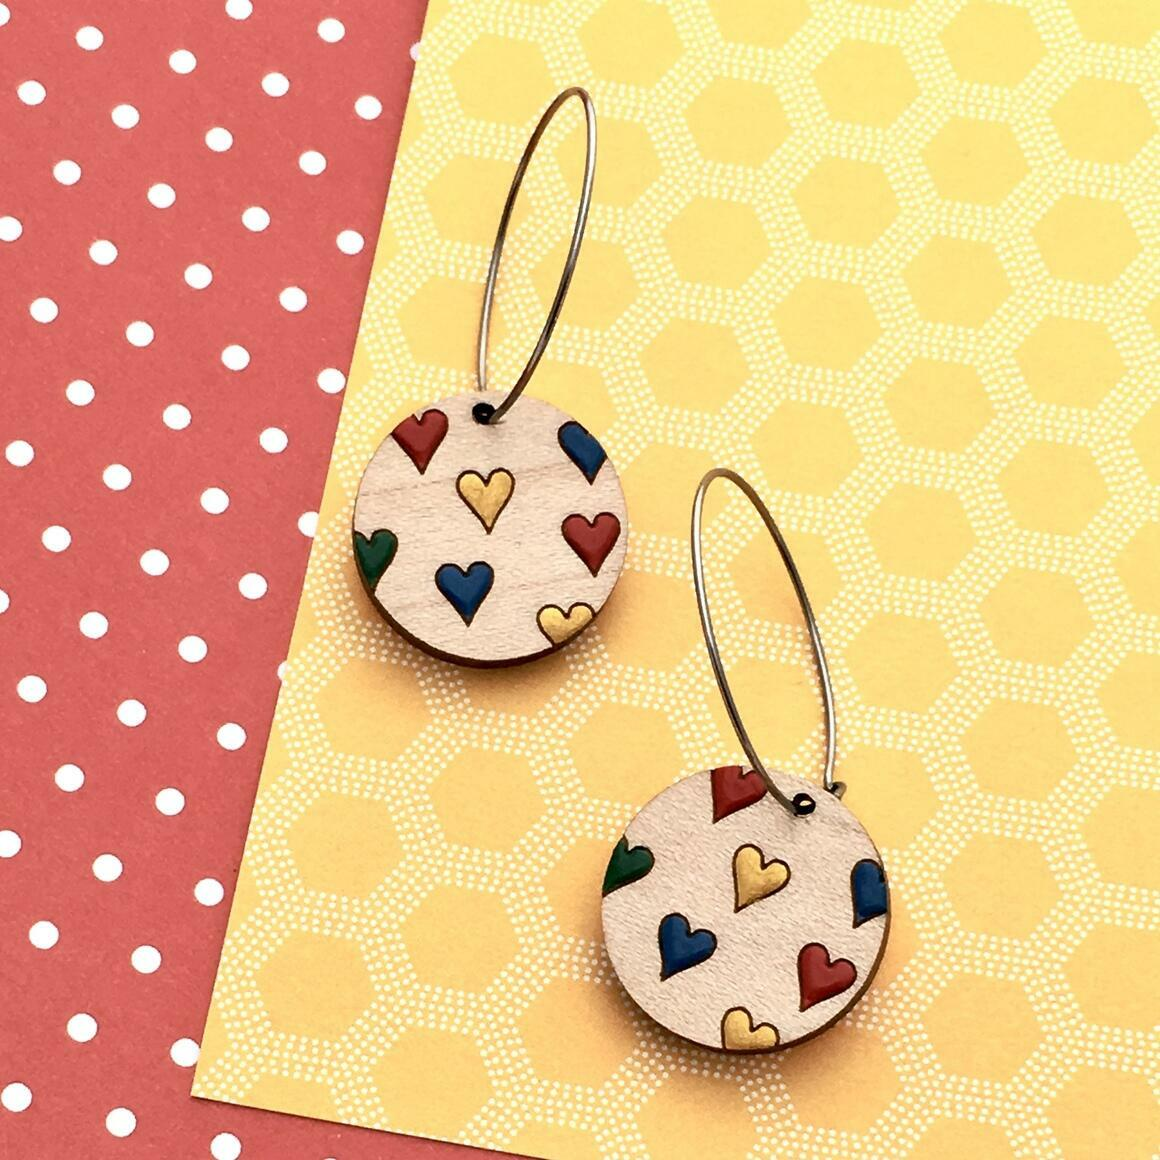 Everyday Confetti Mini Hoop Earrings - Hearts   Trada Marketplace